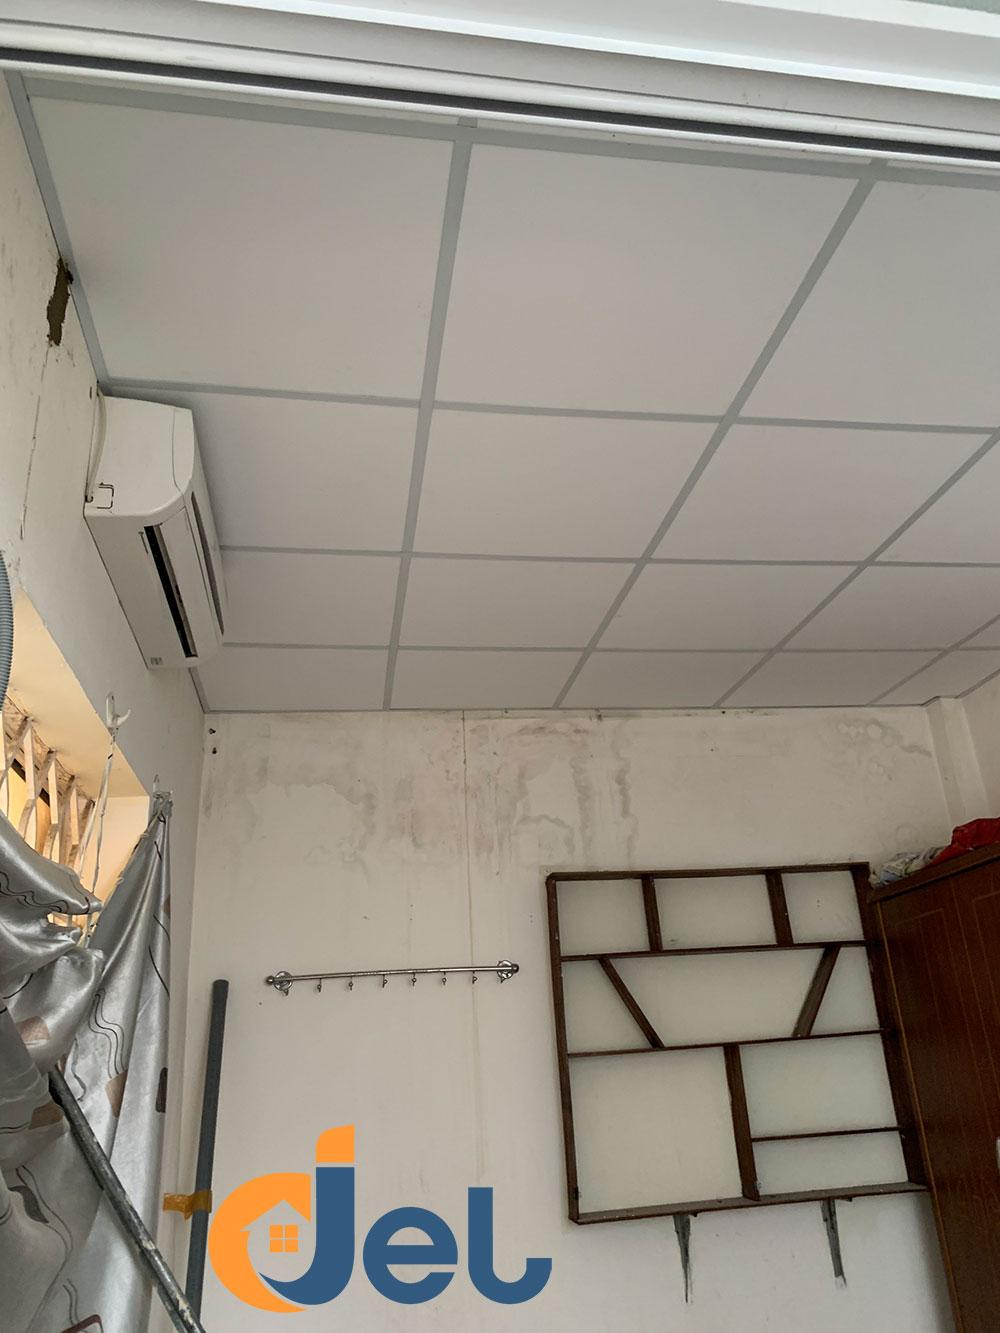 Tầng 2 sau khi cải tạo sửa chựa